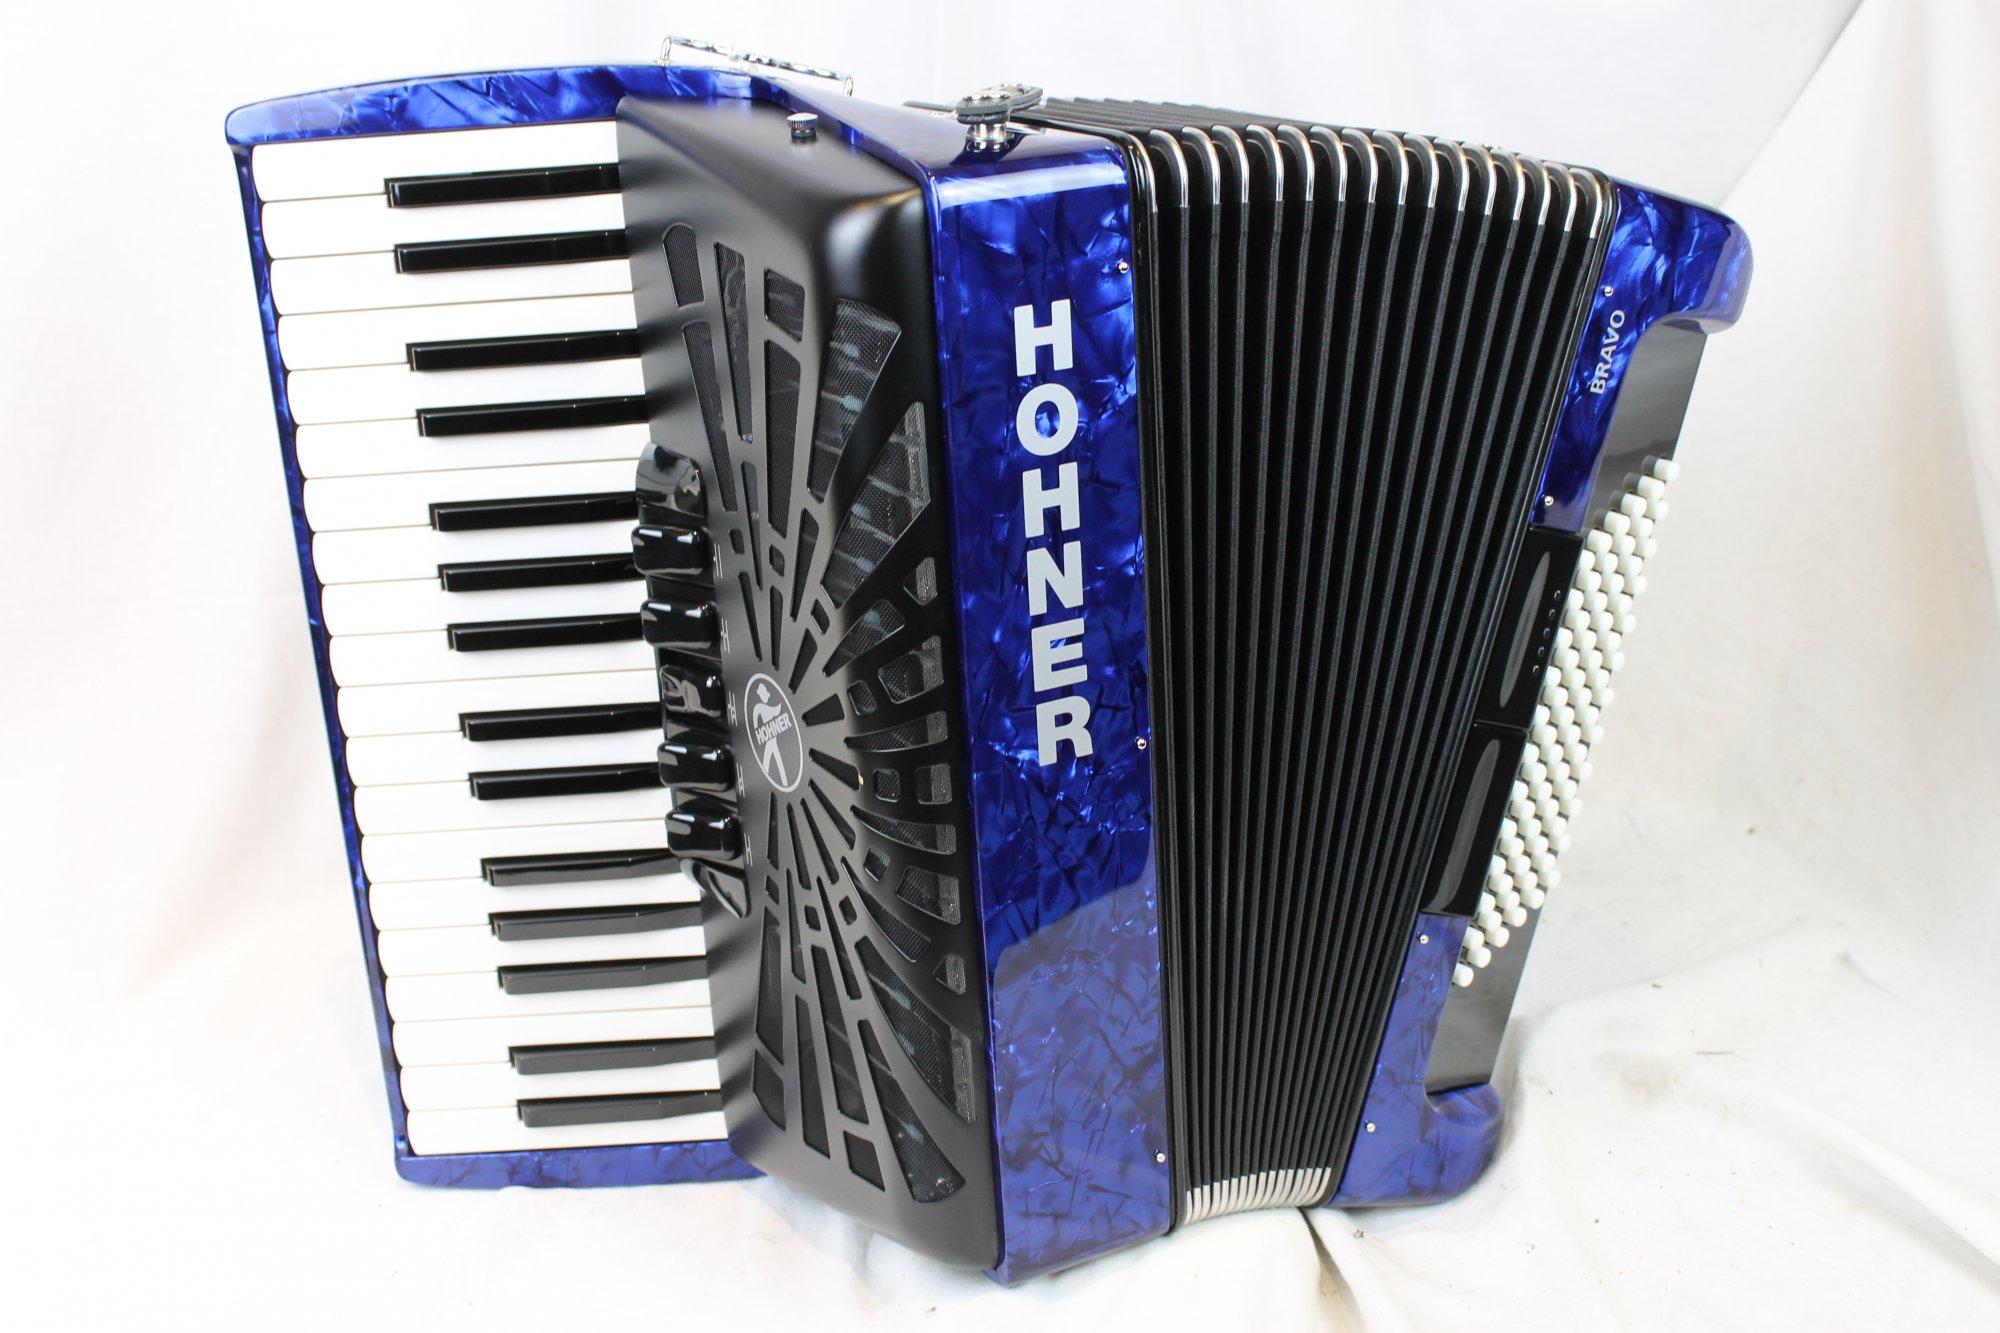 New Blue Hohner Bravo III Piano Accordion LMM 34 72